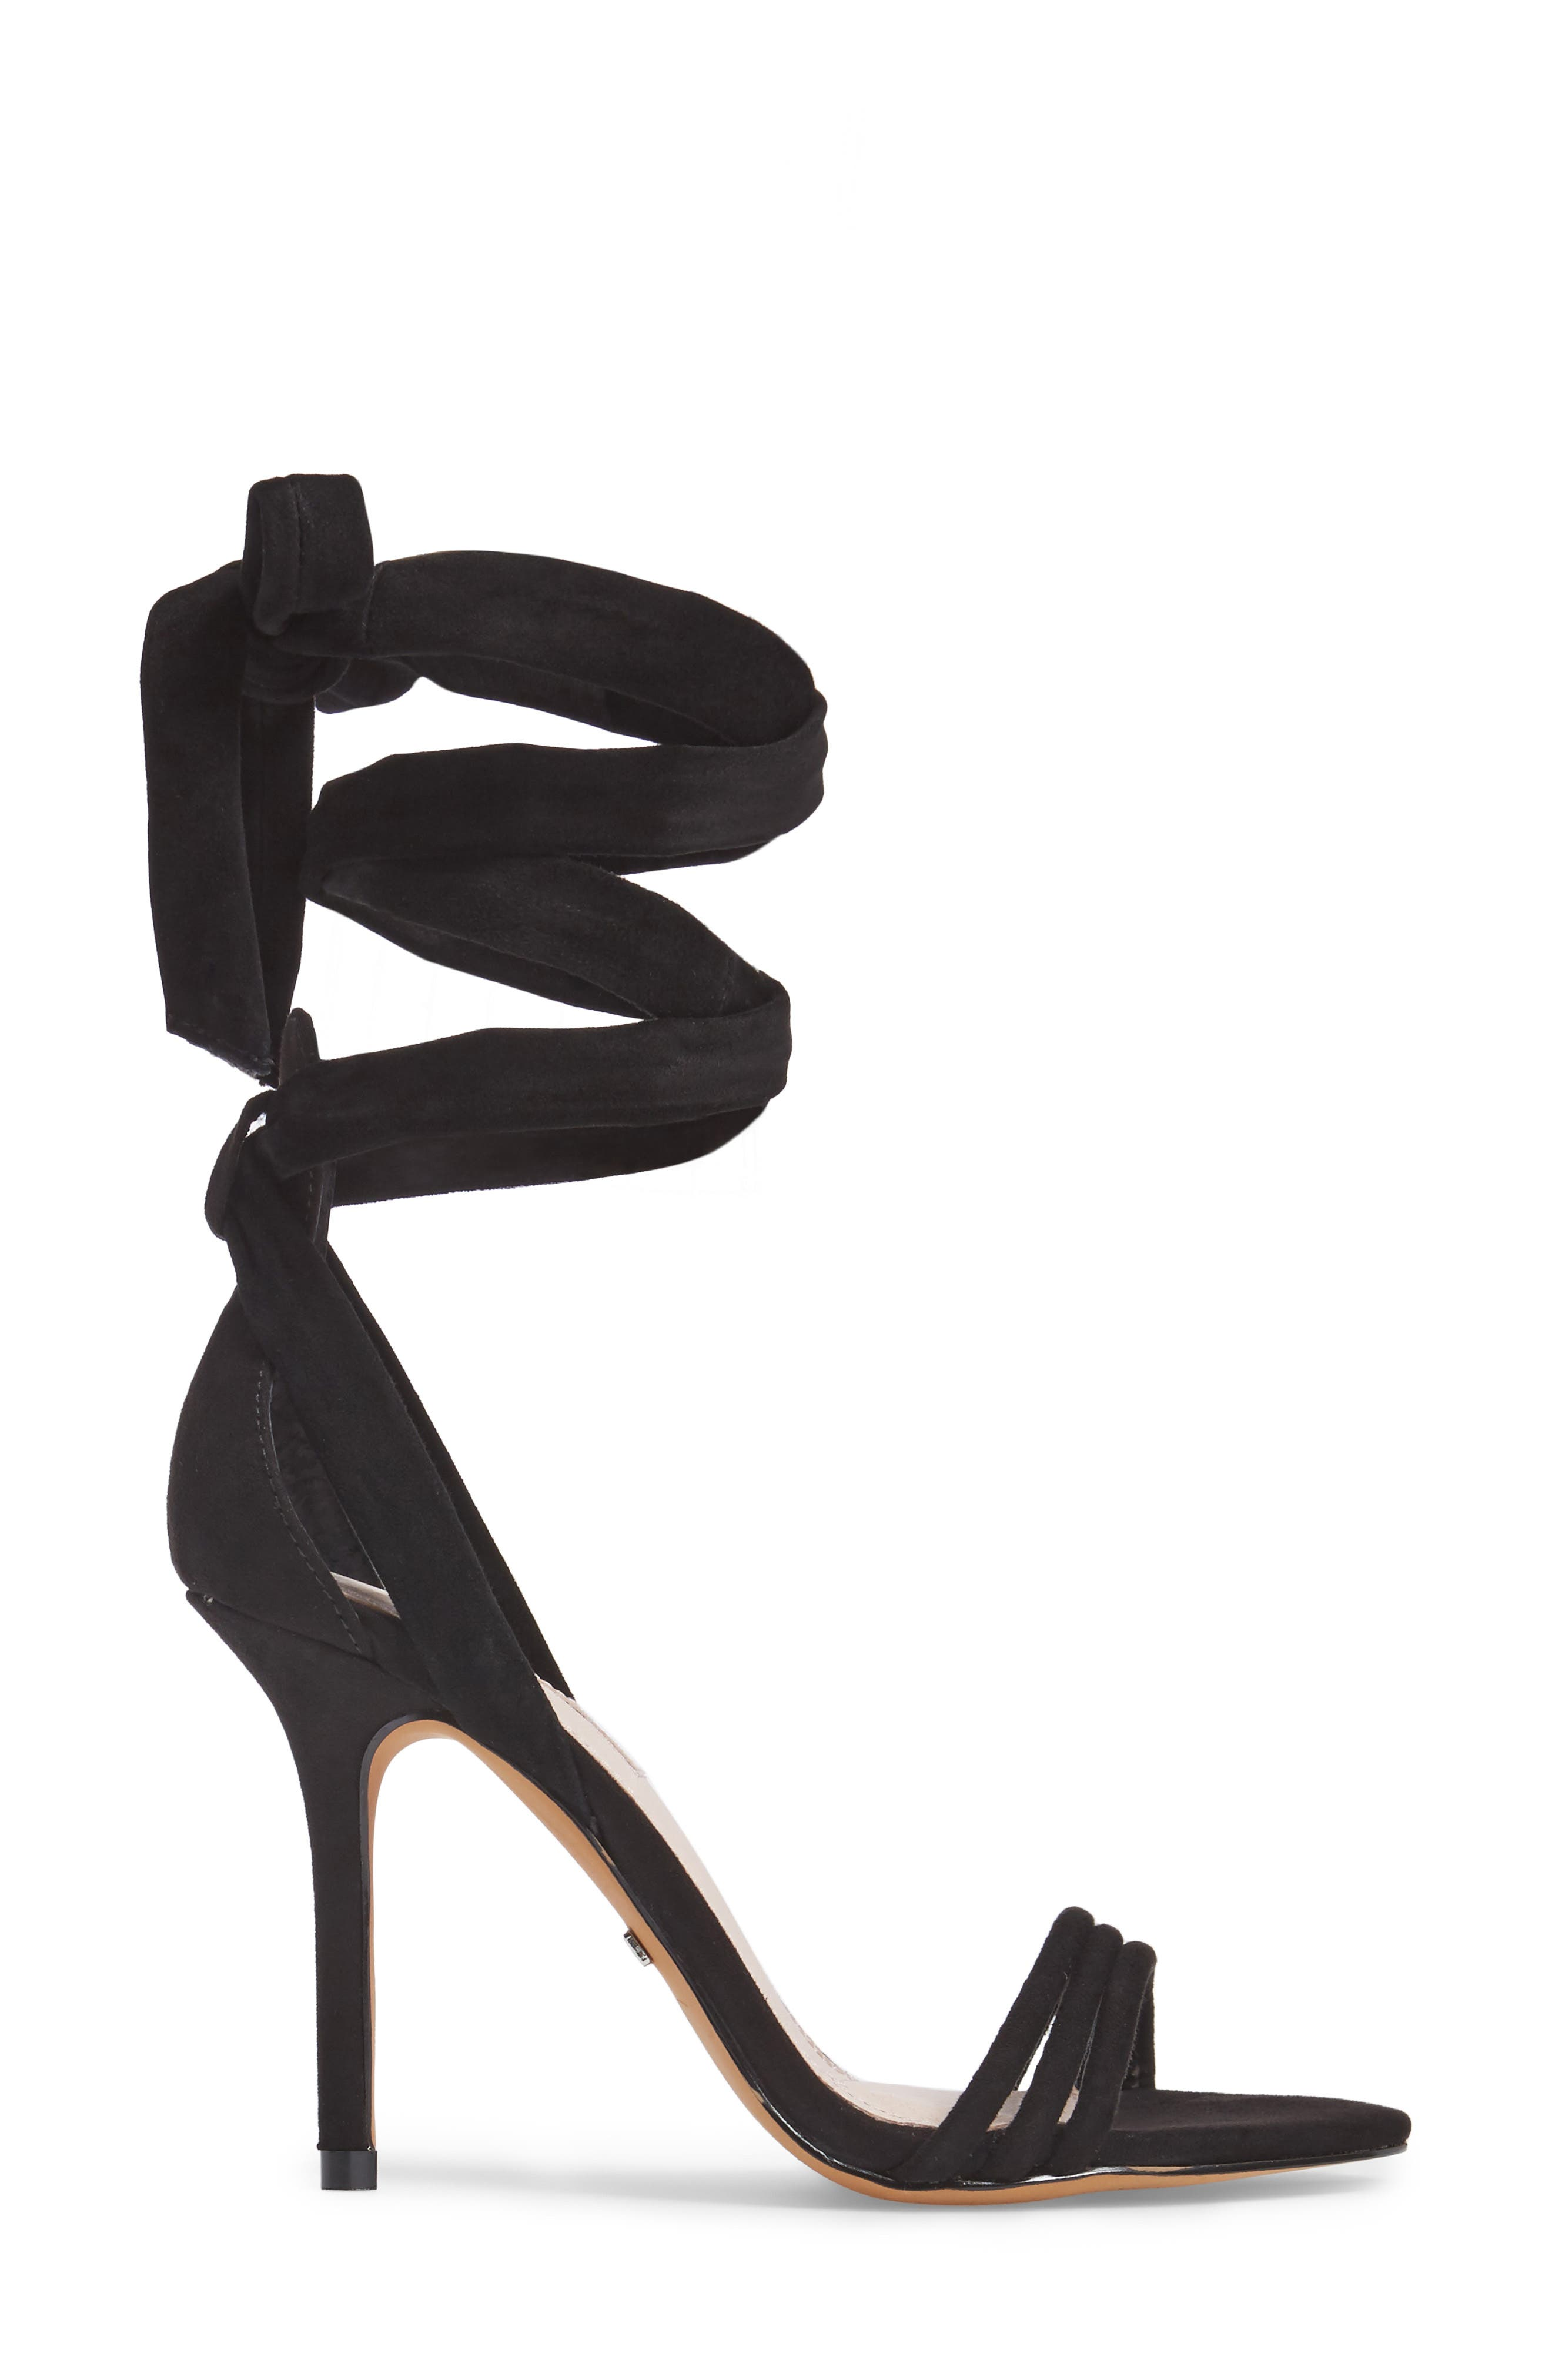 TOPSHOP, Ramona Ankle Wrap Sandal, Alternate thumbnail 3, color, 001